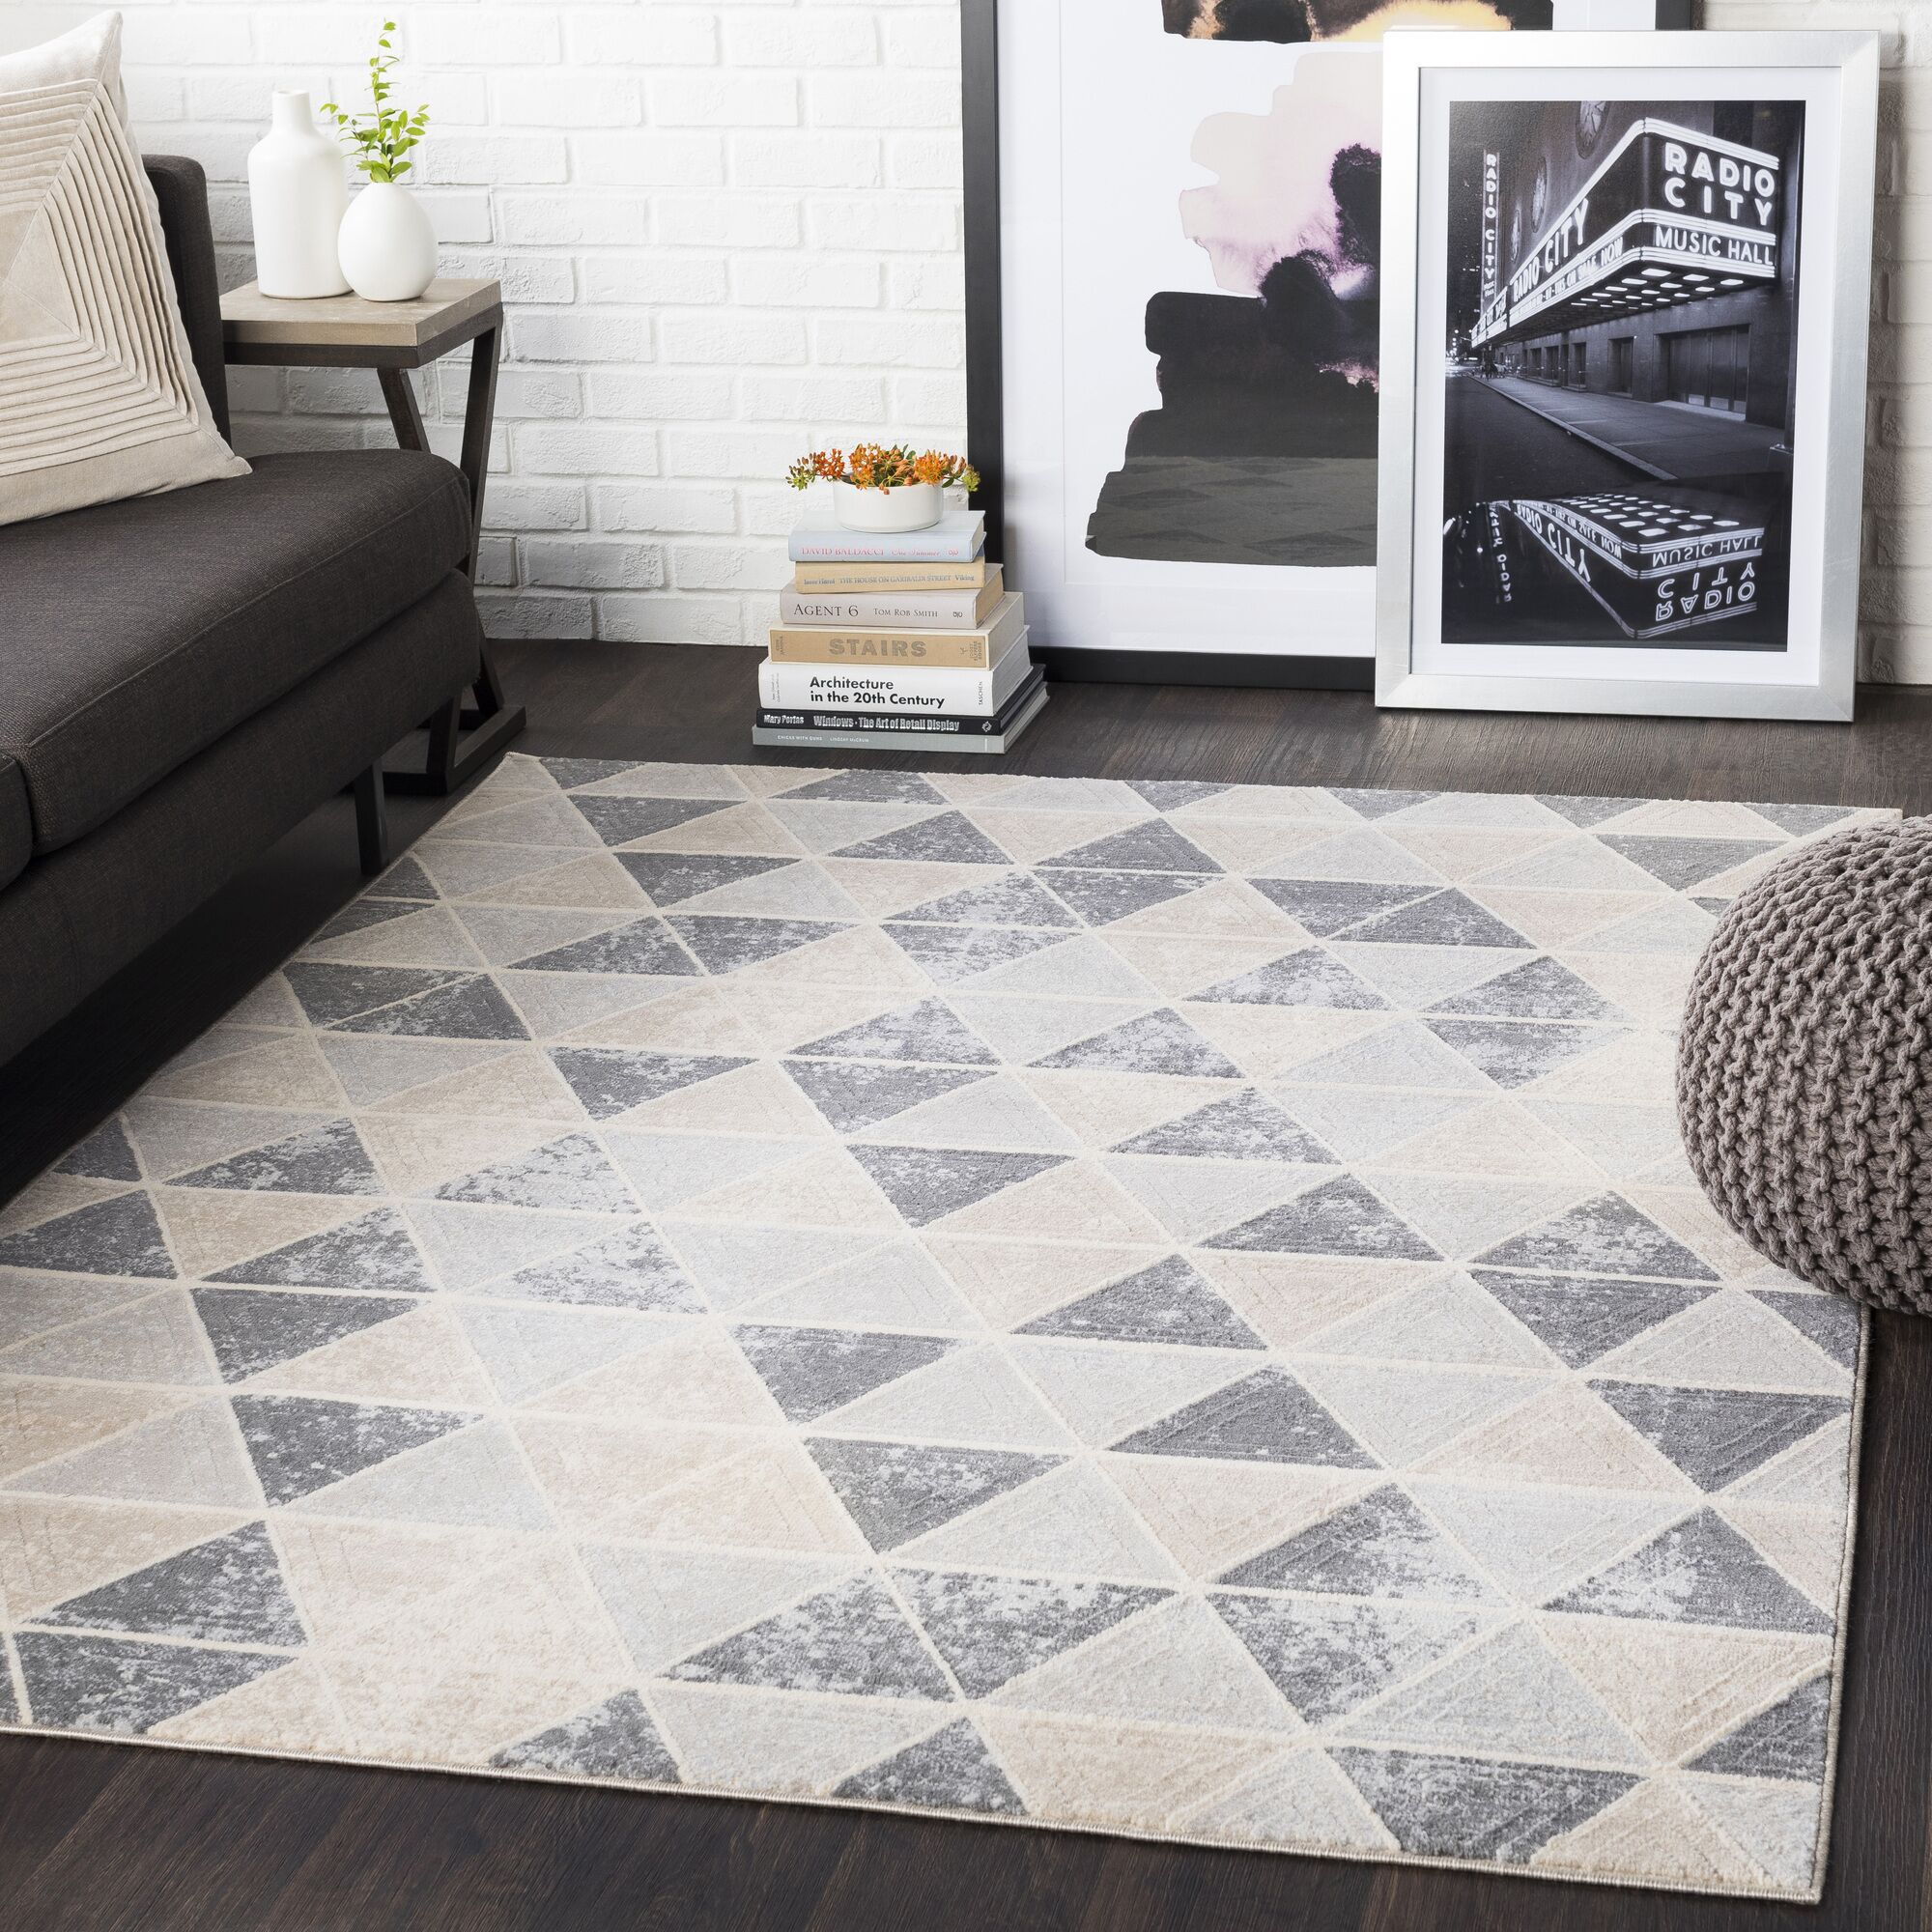 Huerta Geometric Taupe/Light Gray Area Rug Rug Size: Rectangle 3'11